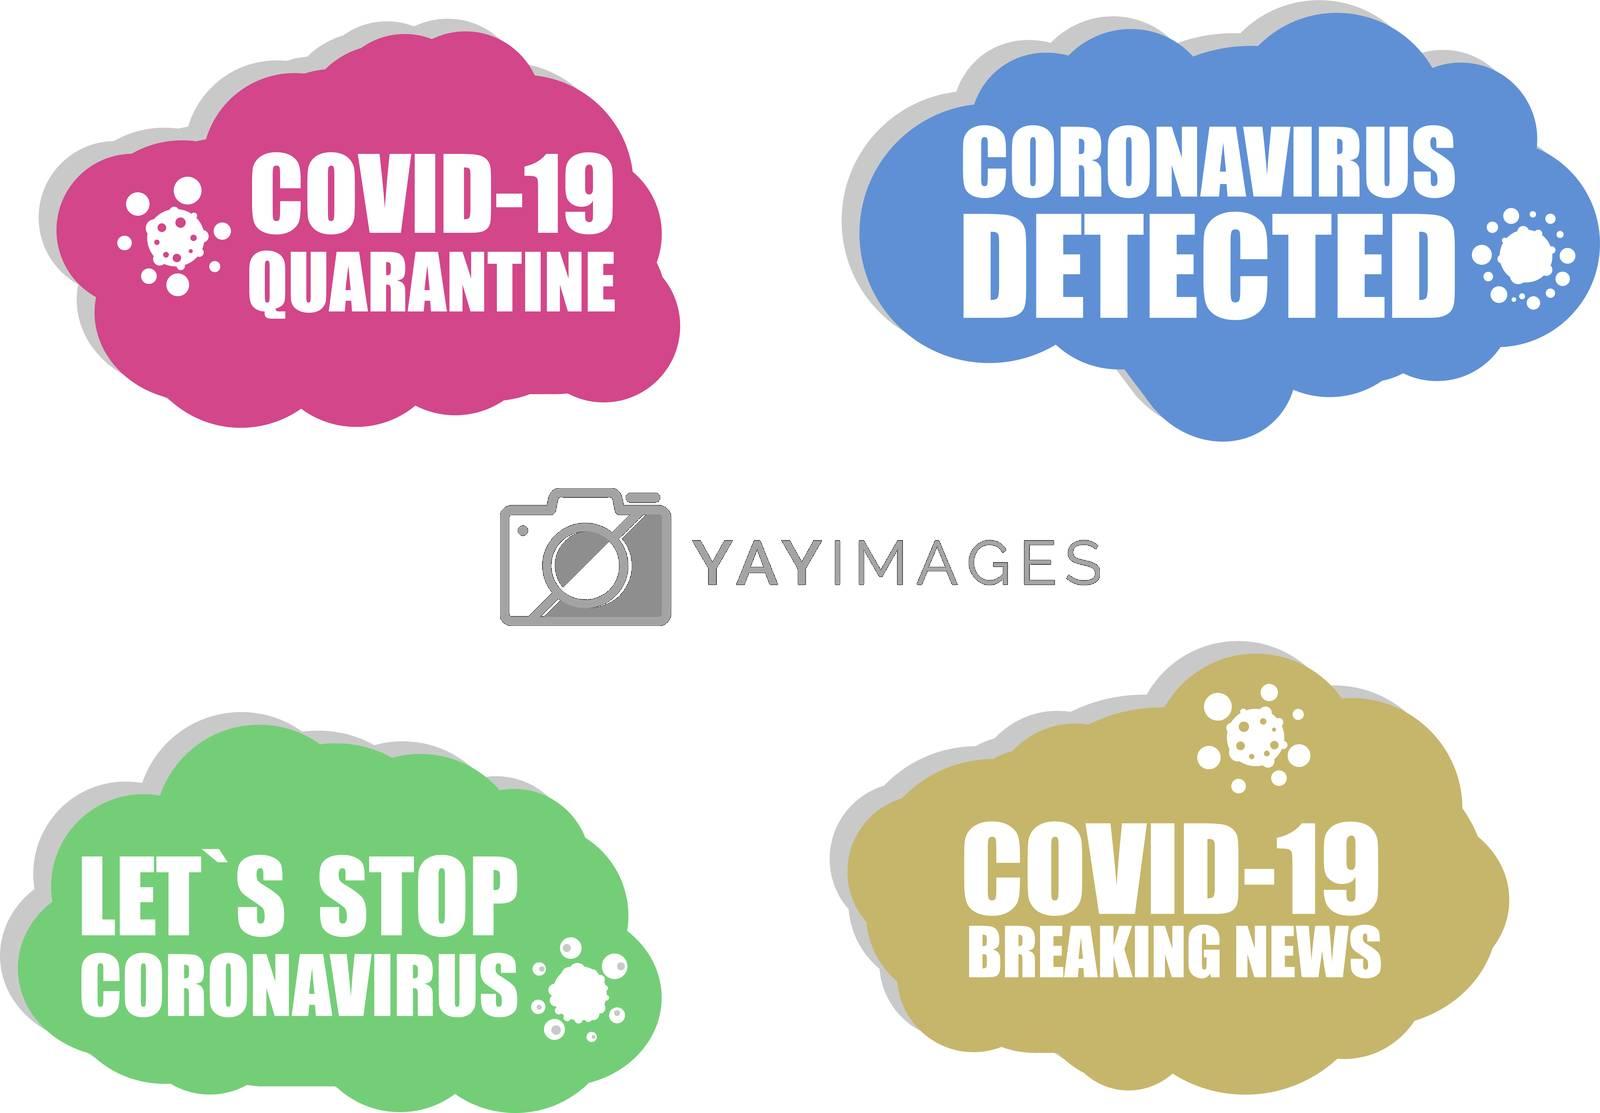 Coronavirus icon. COVID-19 icon. Coronavirus detected. Covid 19 quarantine. Stop Virus COVID 19. Sign set isolated on white background